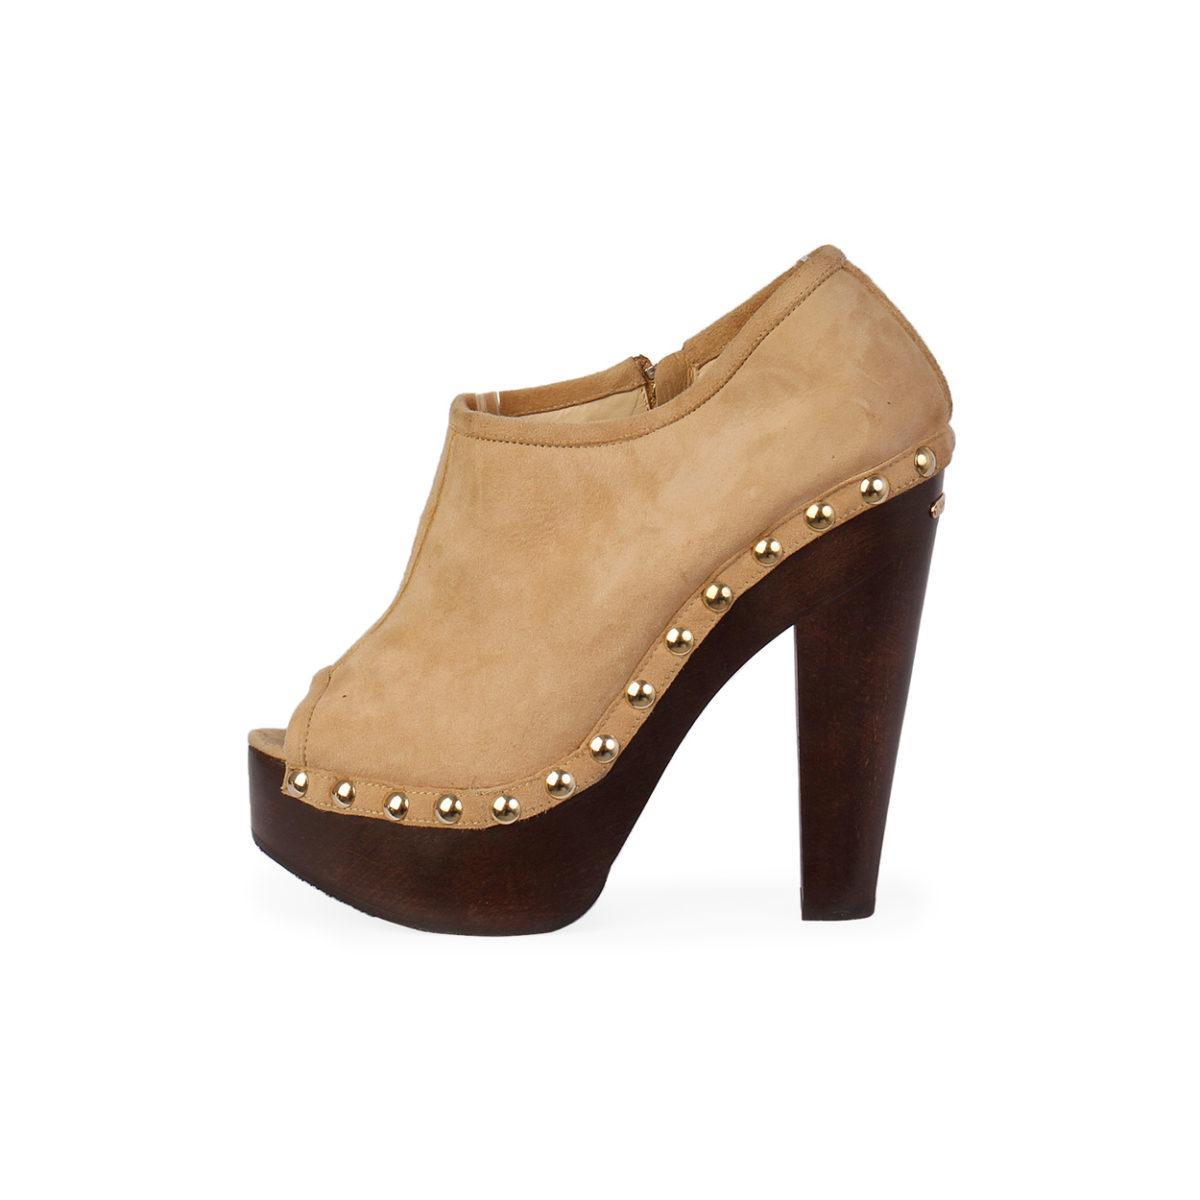 Jimmy Choo Suede Clog Wooden Heel Boots Tan S 39 6